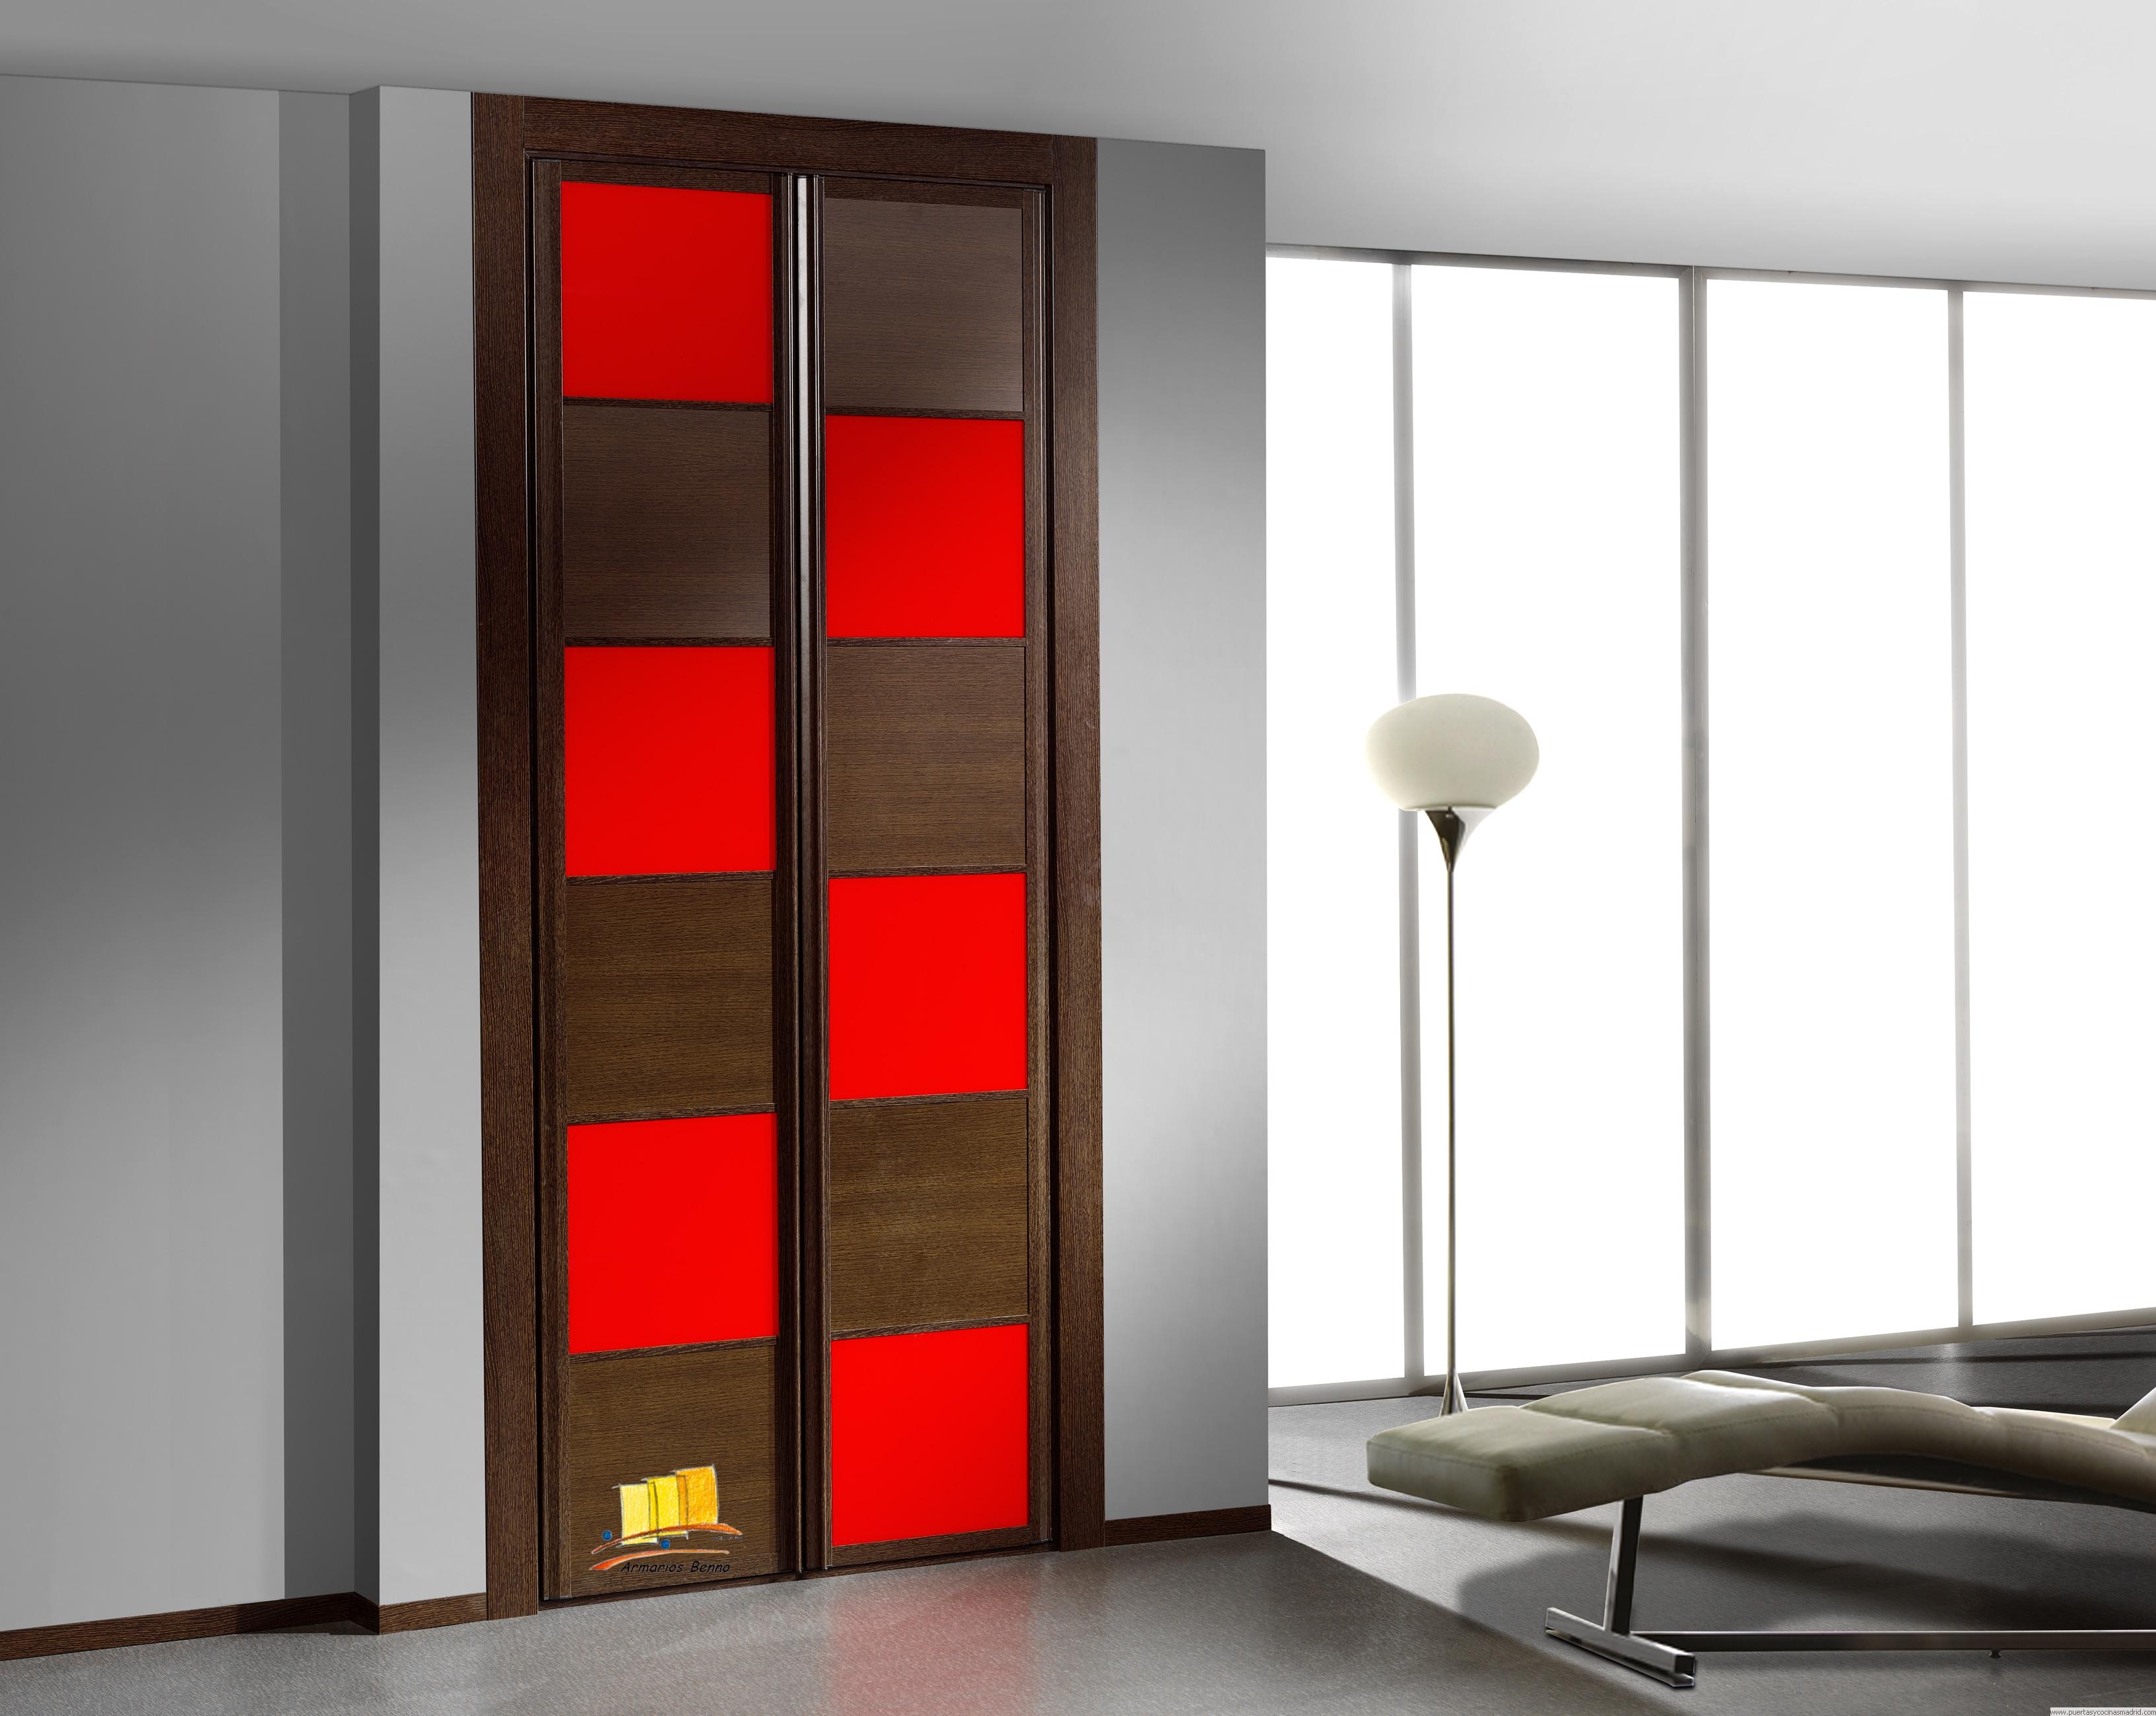 Armarios interior madrid armarios baratos comprar armarios for Armarios empotrados modernos